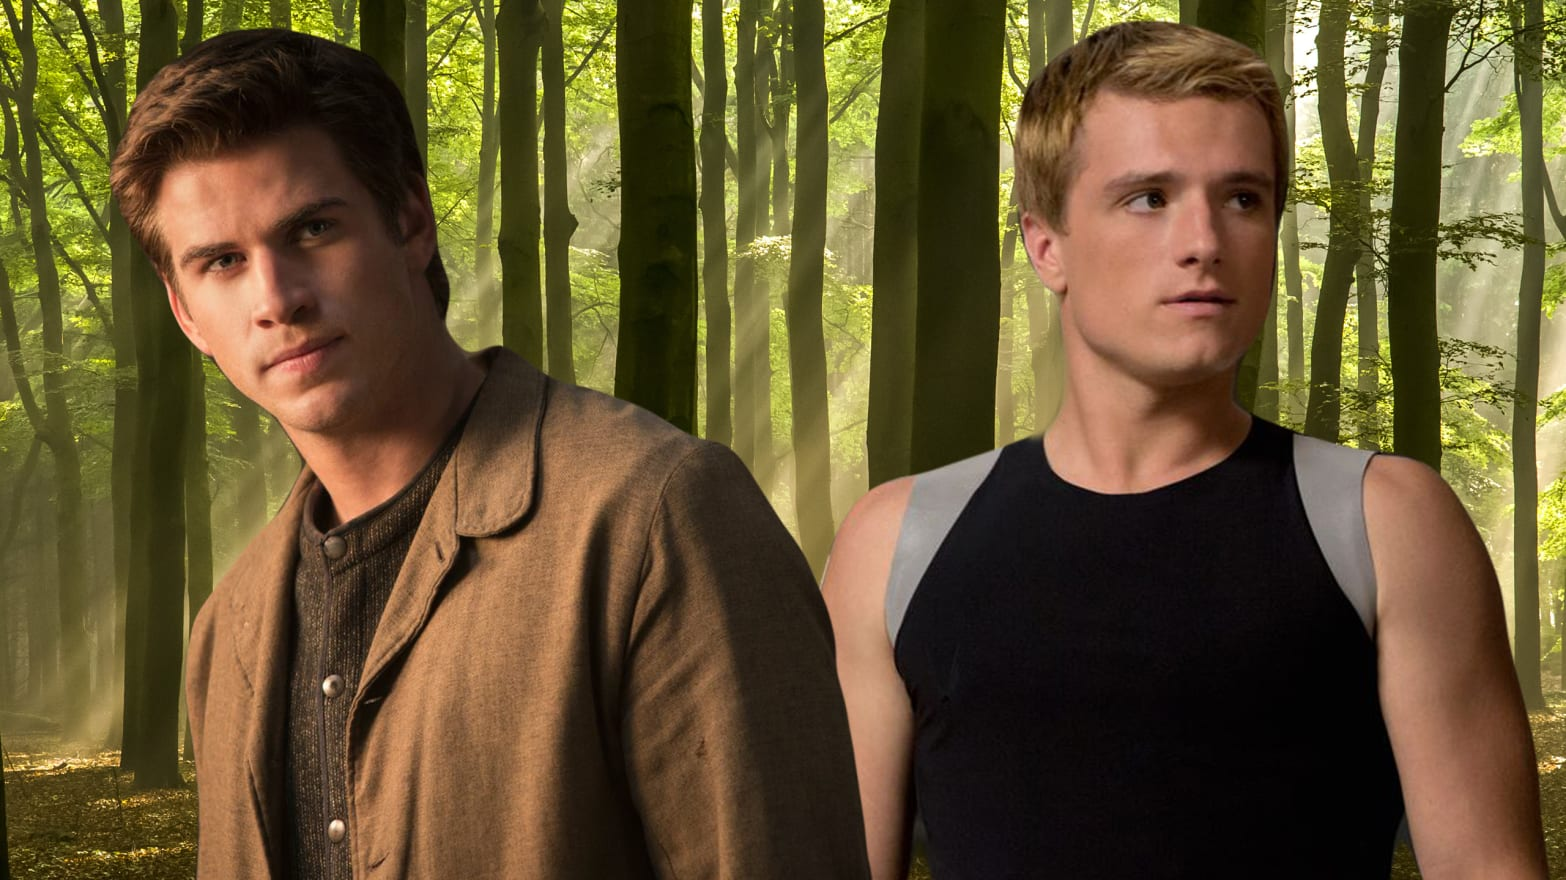 Team Peeta or Team Gale: Why the 'Hunger Games' Love Triangle ...